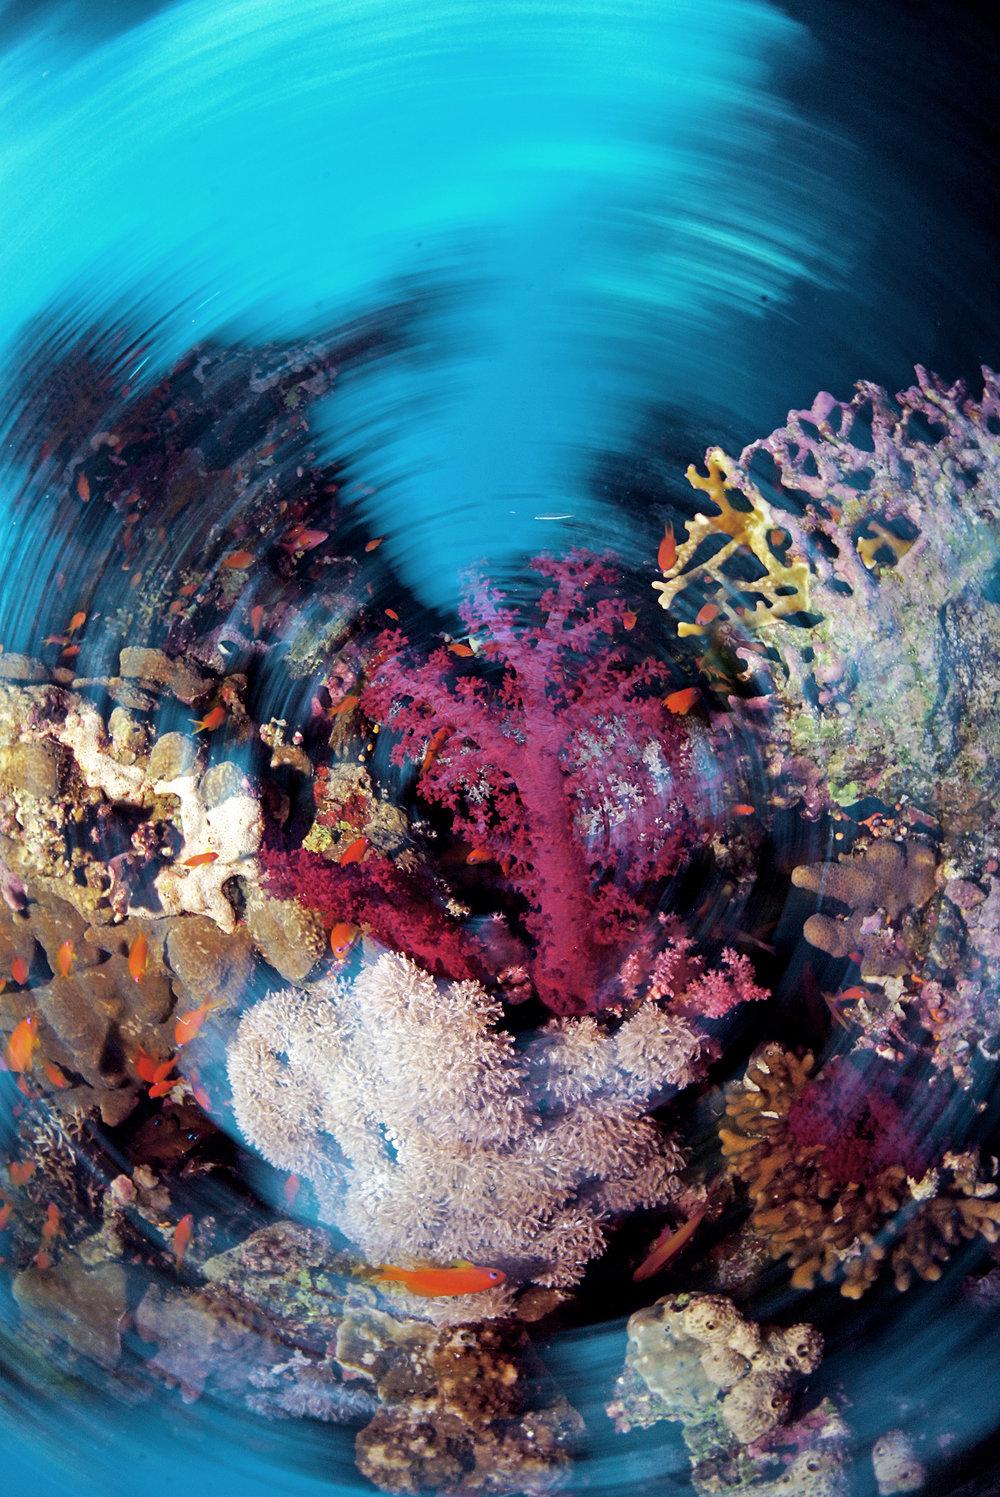 spinning corals CRedit: Cinzia Osele Bismarck / coral reef image bank